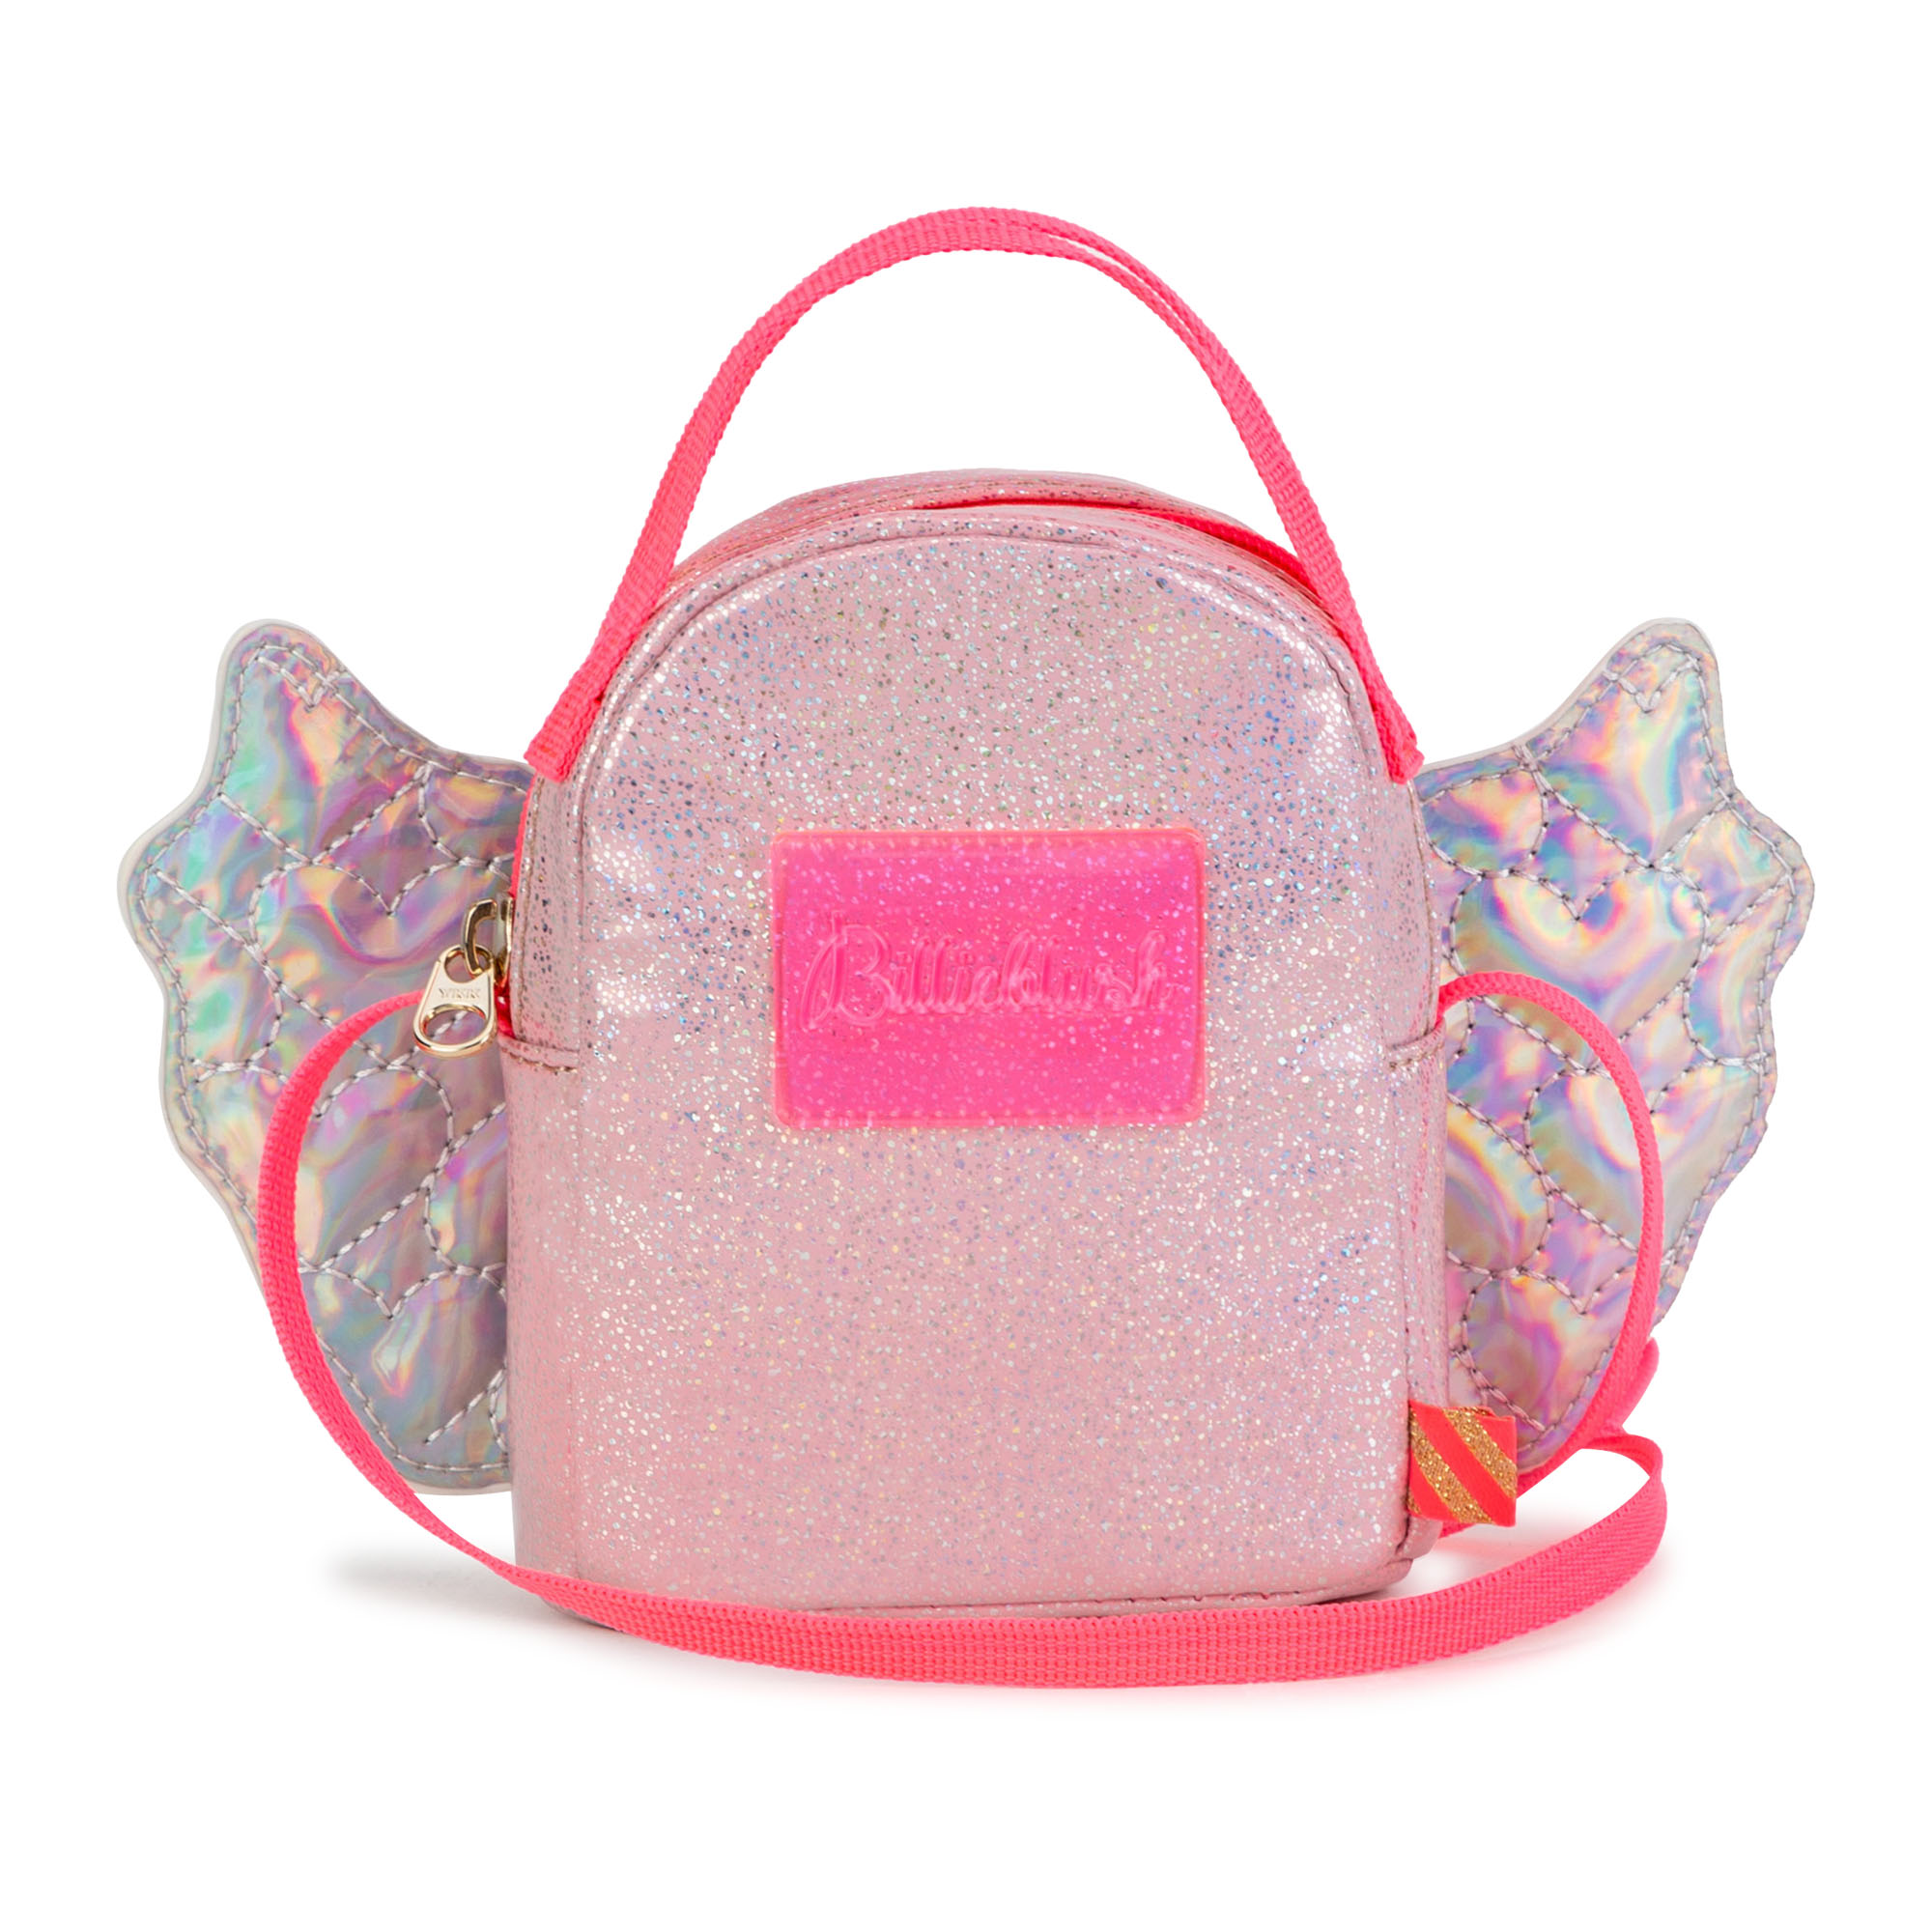 Winged handbag BILLIEBLUSH for GIRL